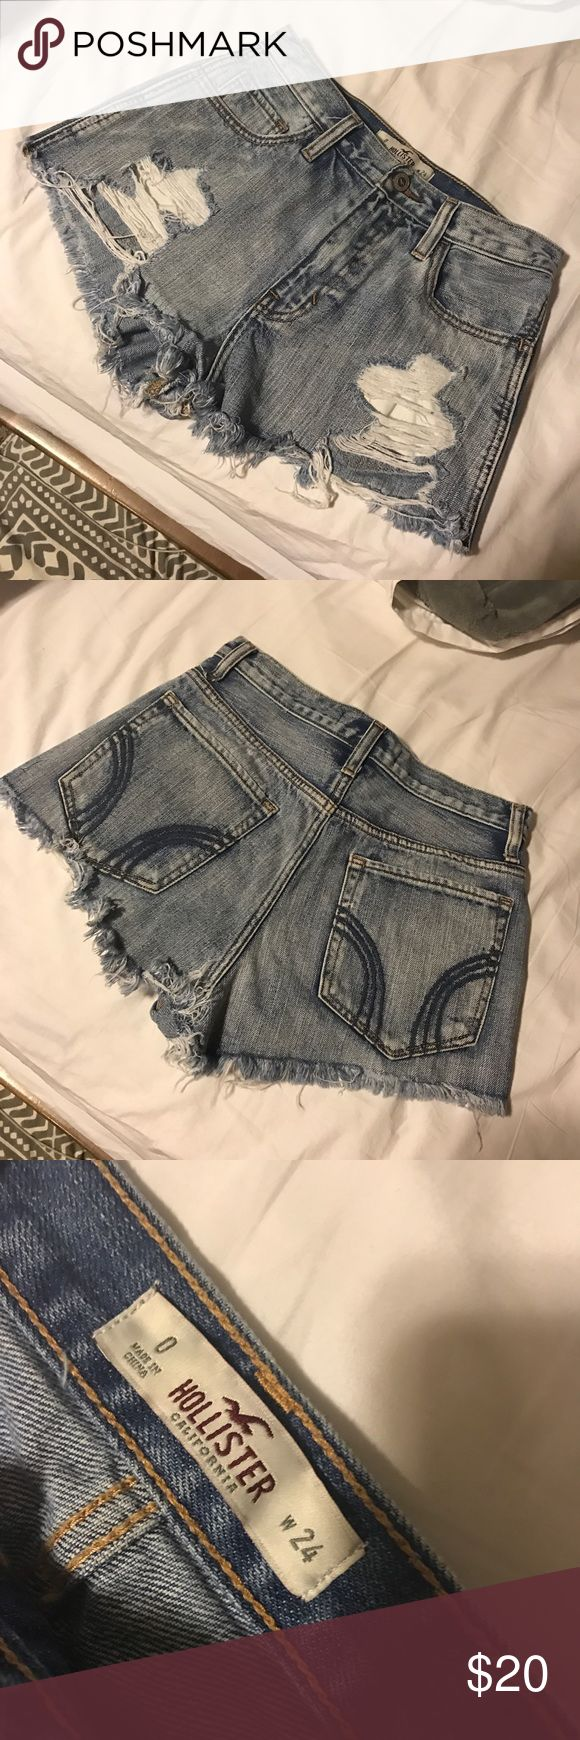 Cutoff jean shorts Hollister cutoff jean shorts. Never worn! (Too small) Hollister Shorts Jean Shorts